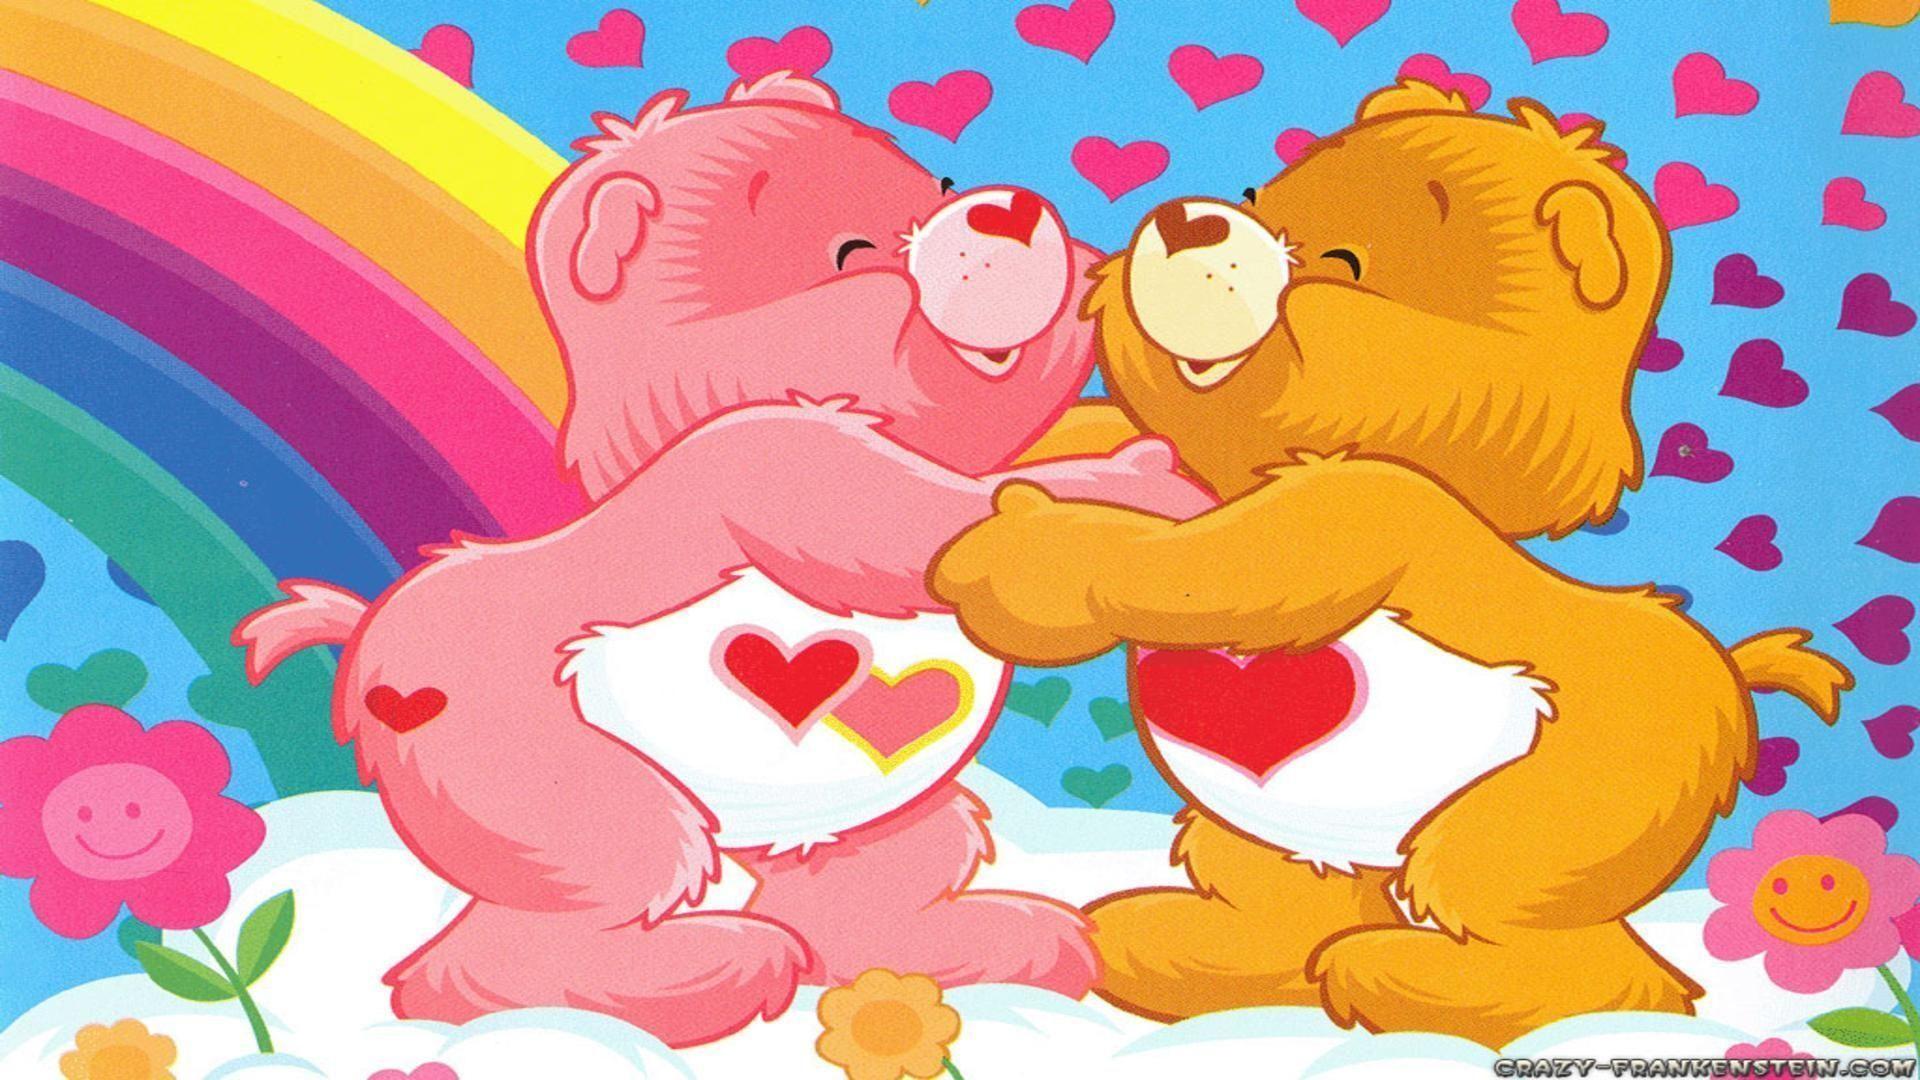 Care bears love wallpapers free desktop background – free .